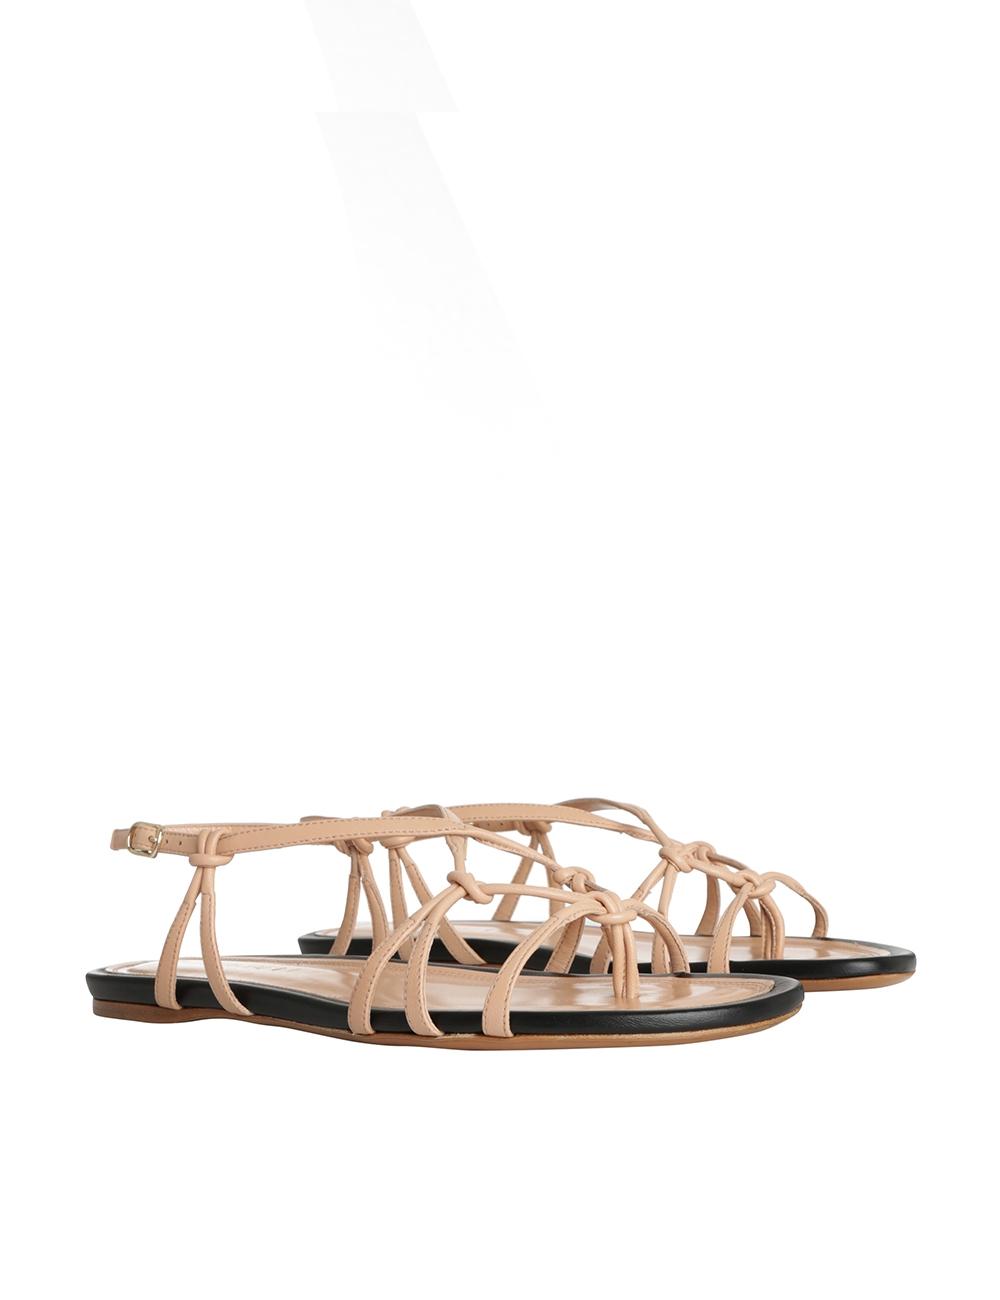 Shop Women's Designer Shoes Online | ZIMMERMANN